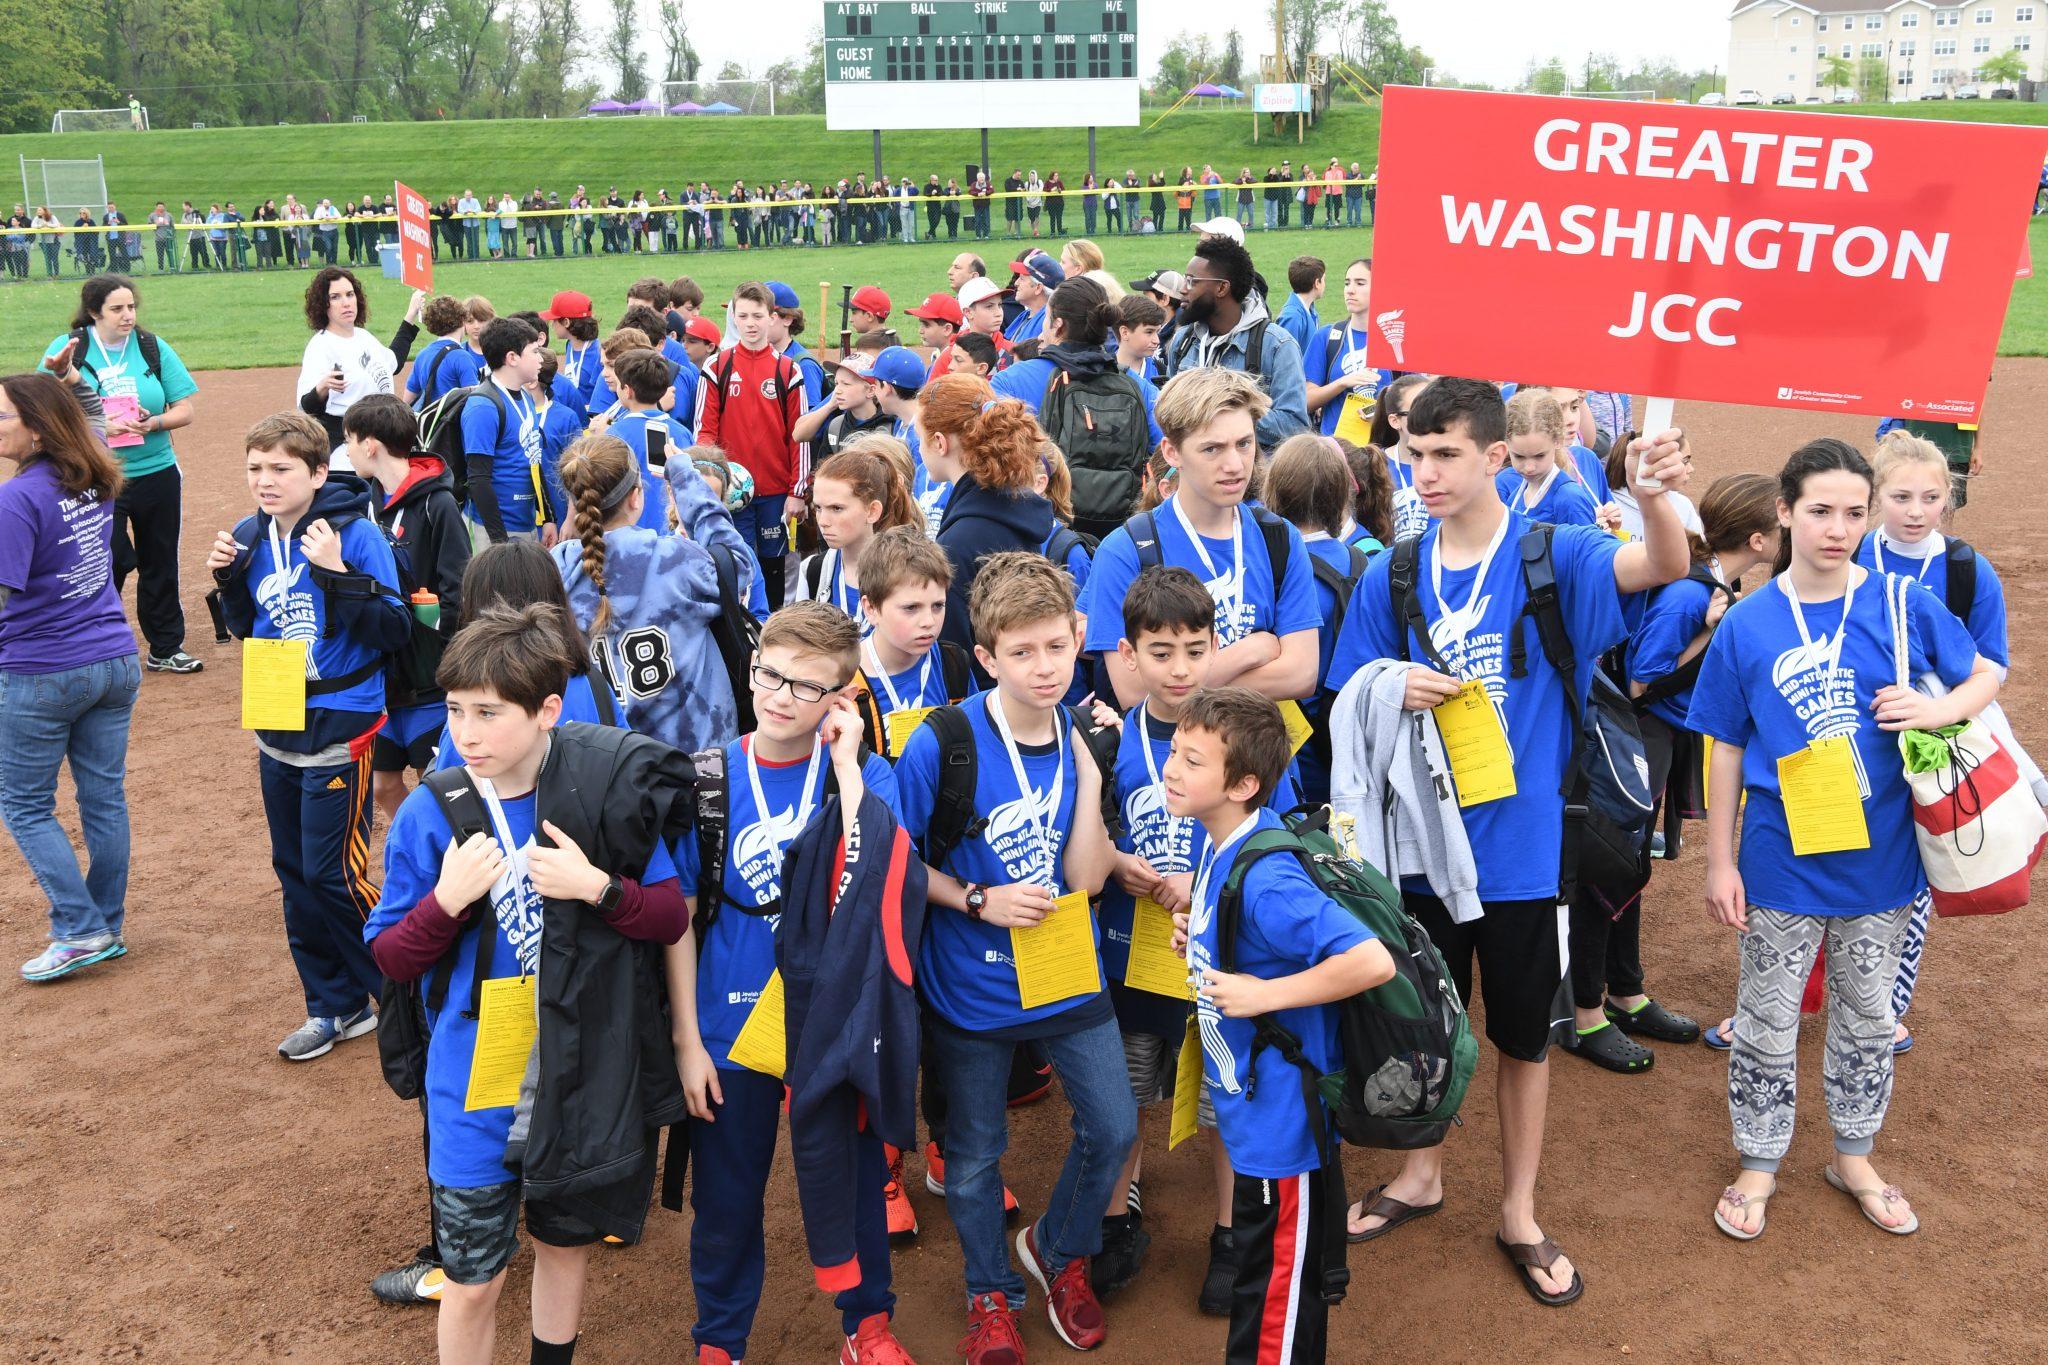 Greater Washington JCC